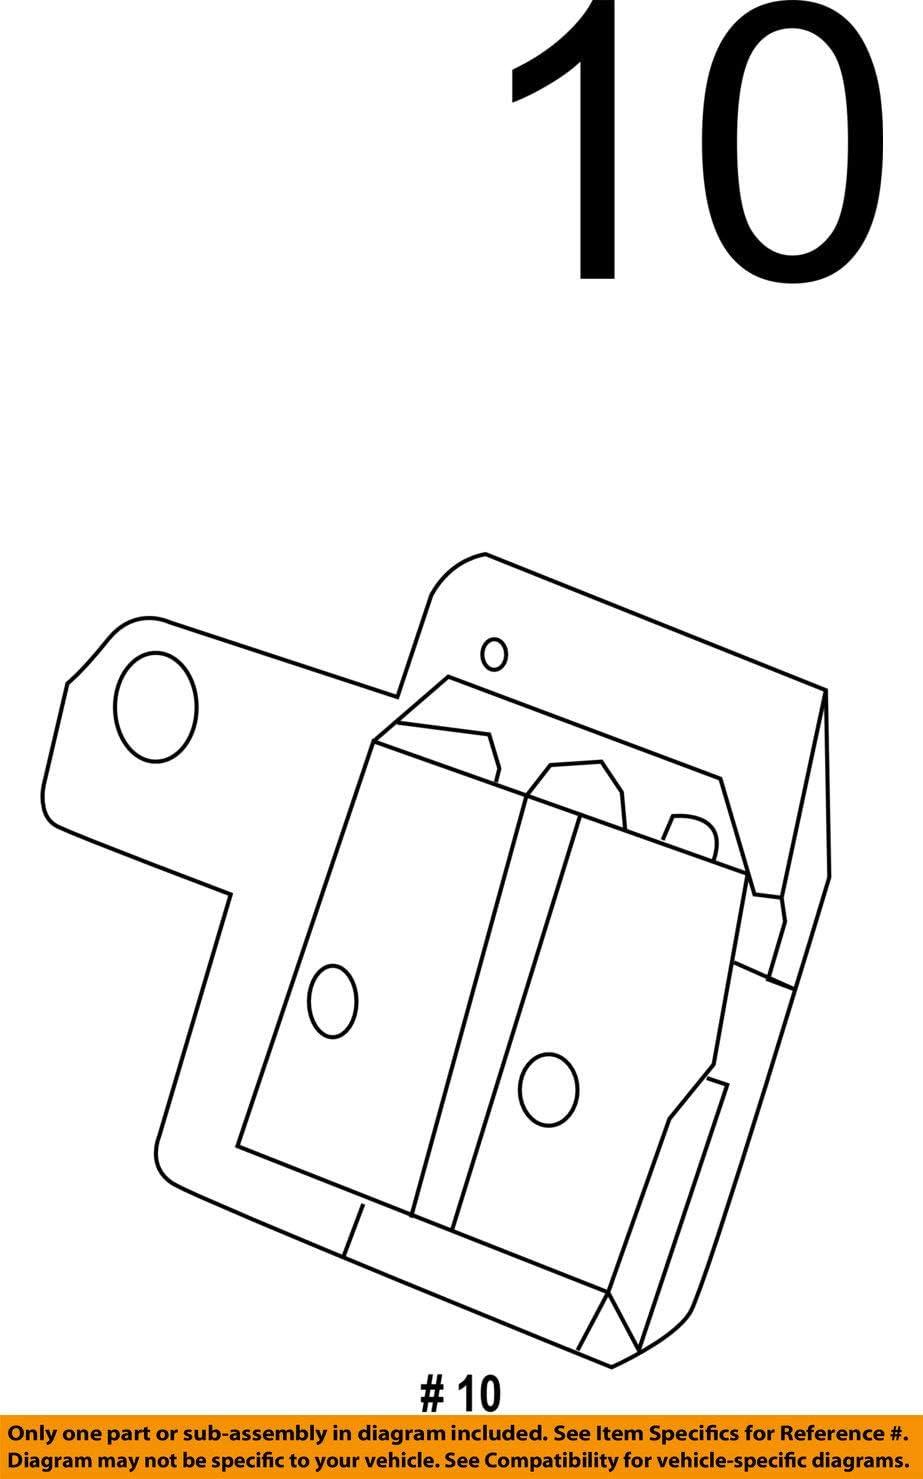 Genuine Honda 1B770-RW0-000 Powertrain Control Unit Insulator Assembly